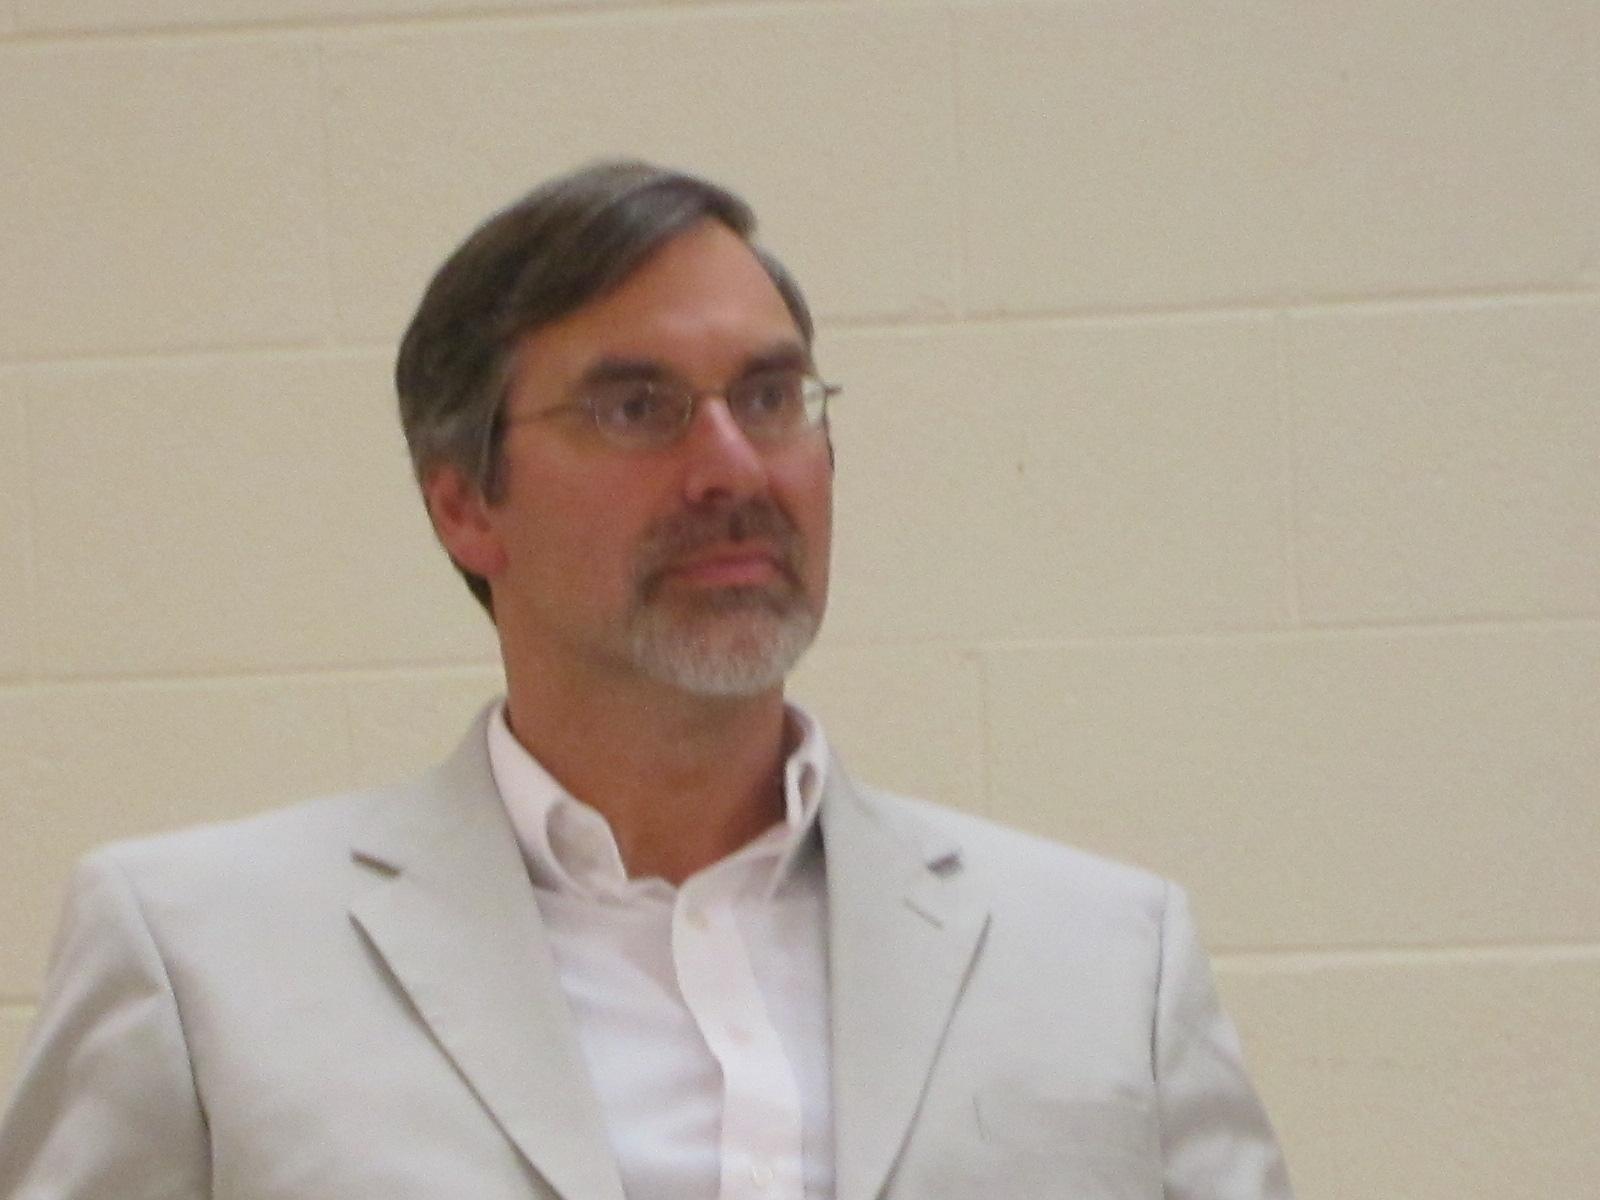 city attorney joe reitman with a distinguished goatee